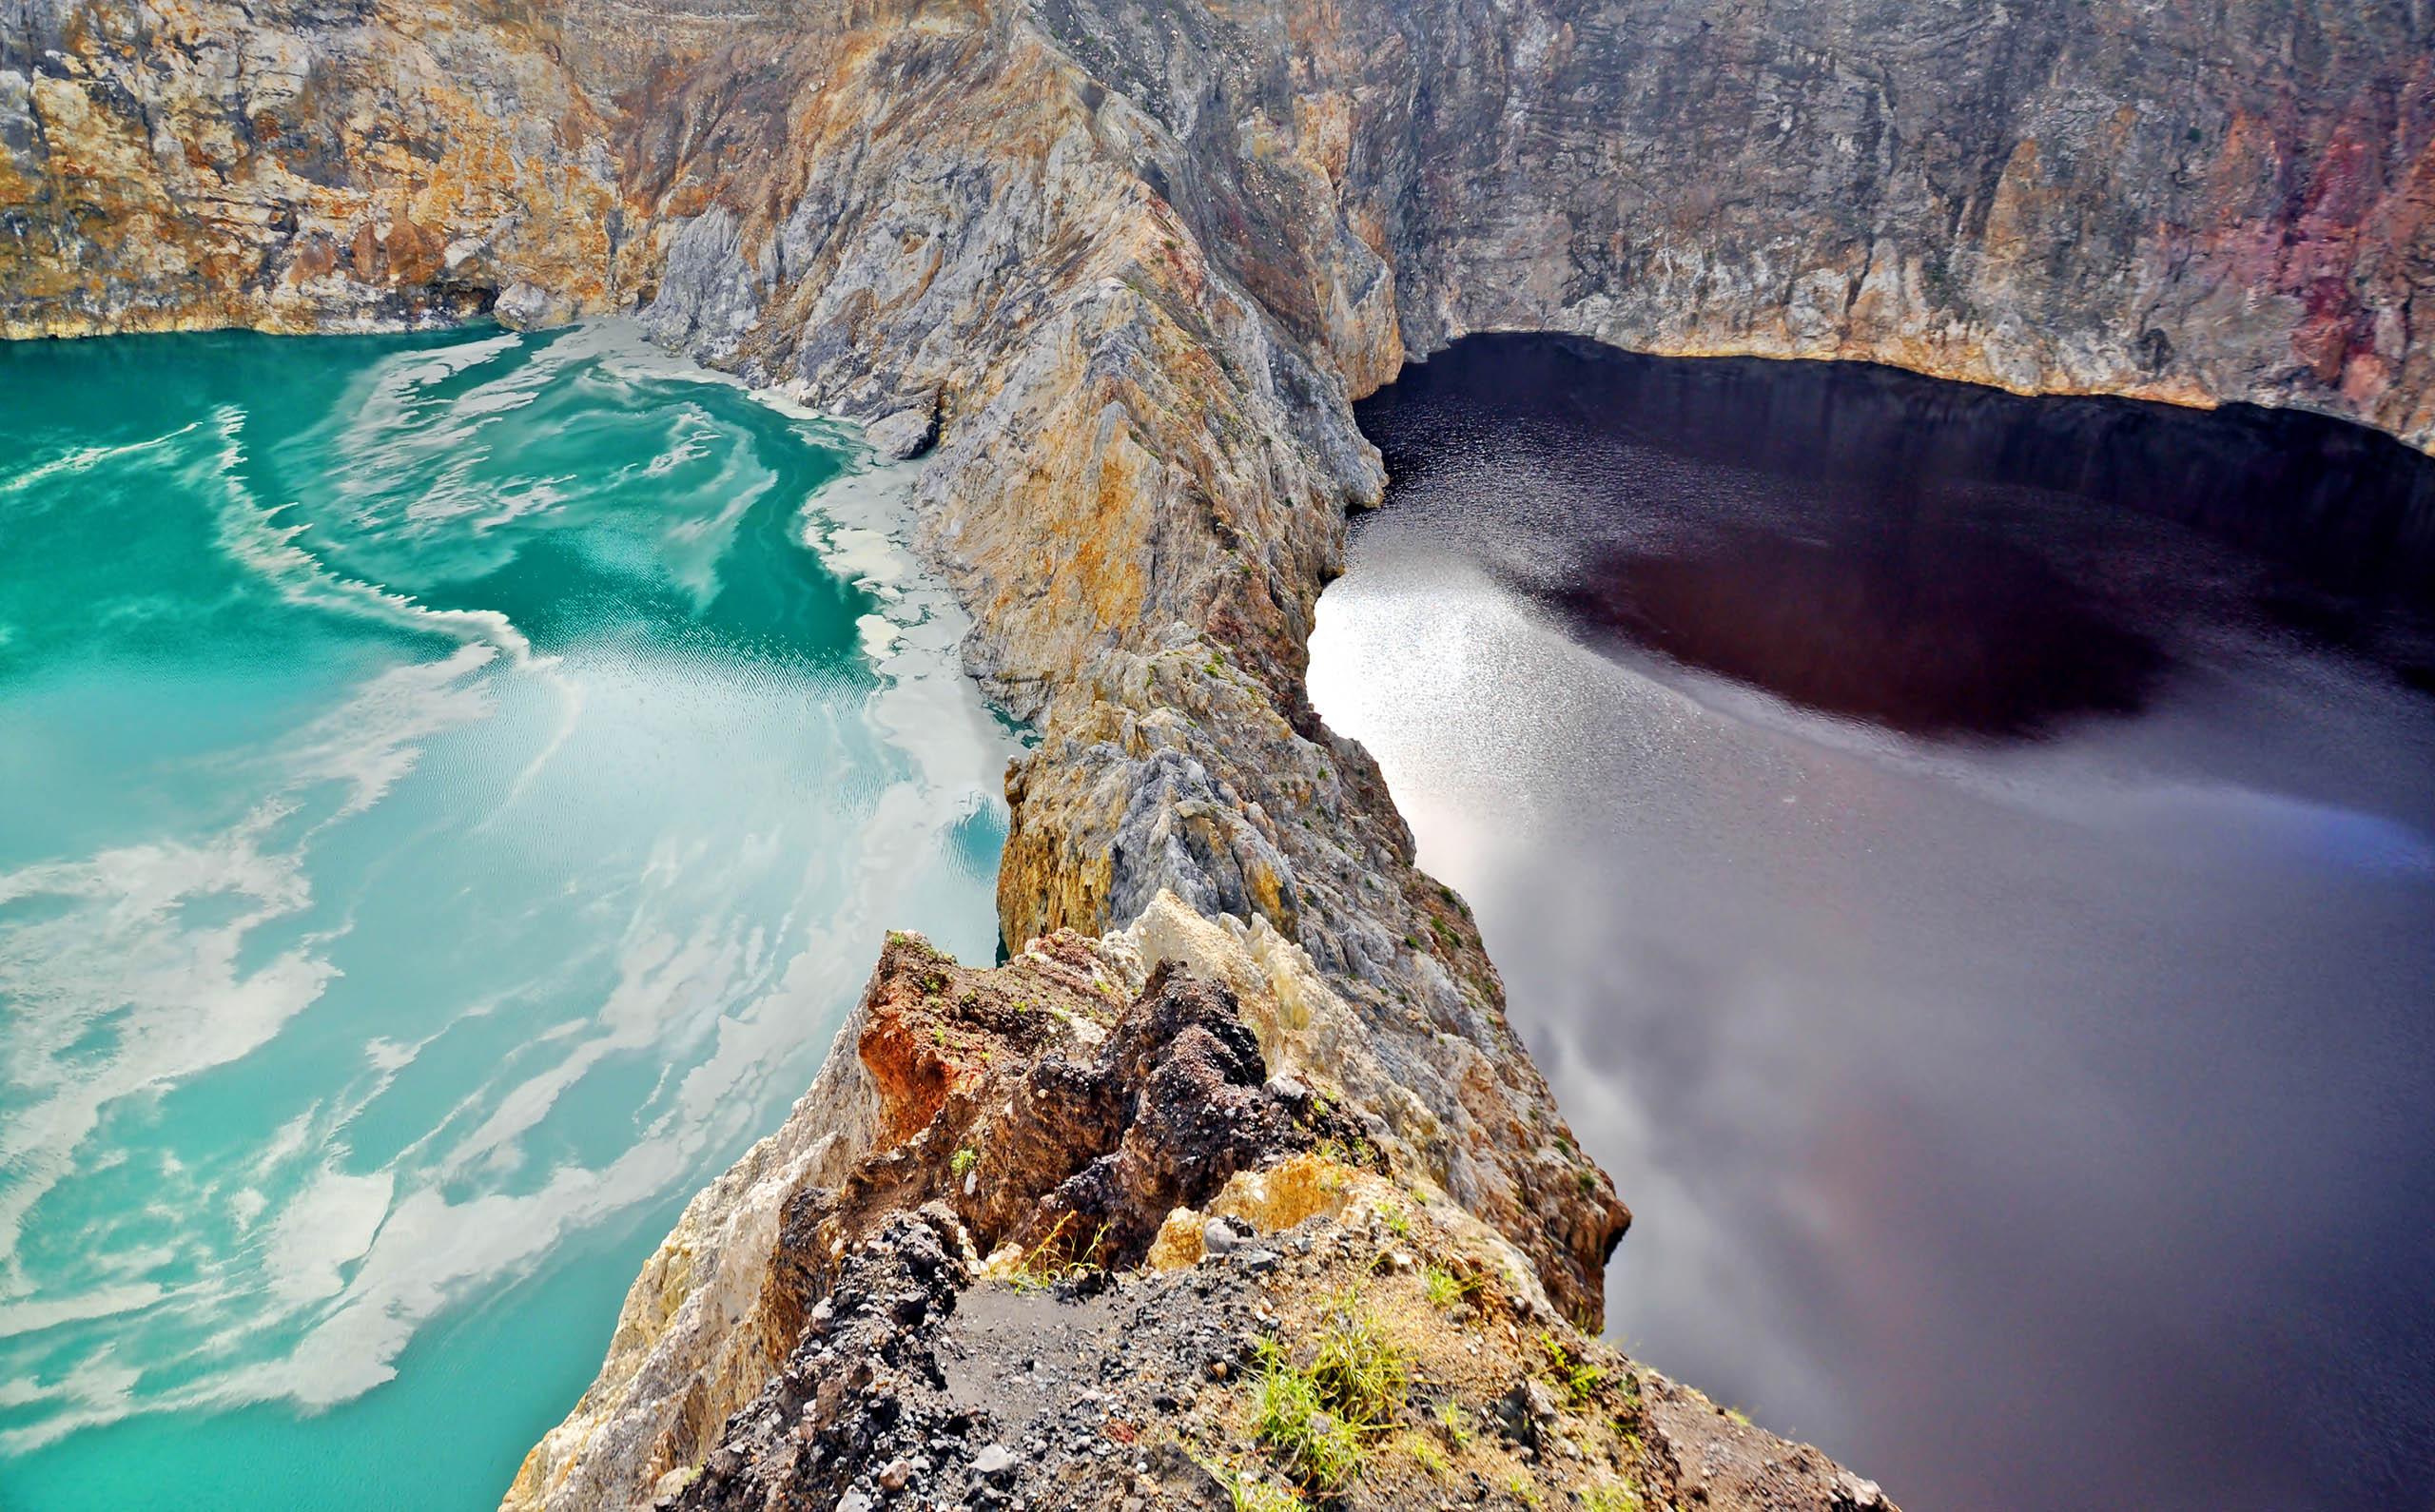 Mandara kelimutu éco-tourisme indonésie